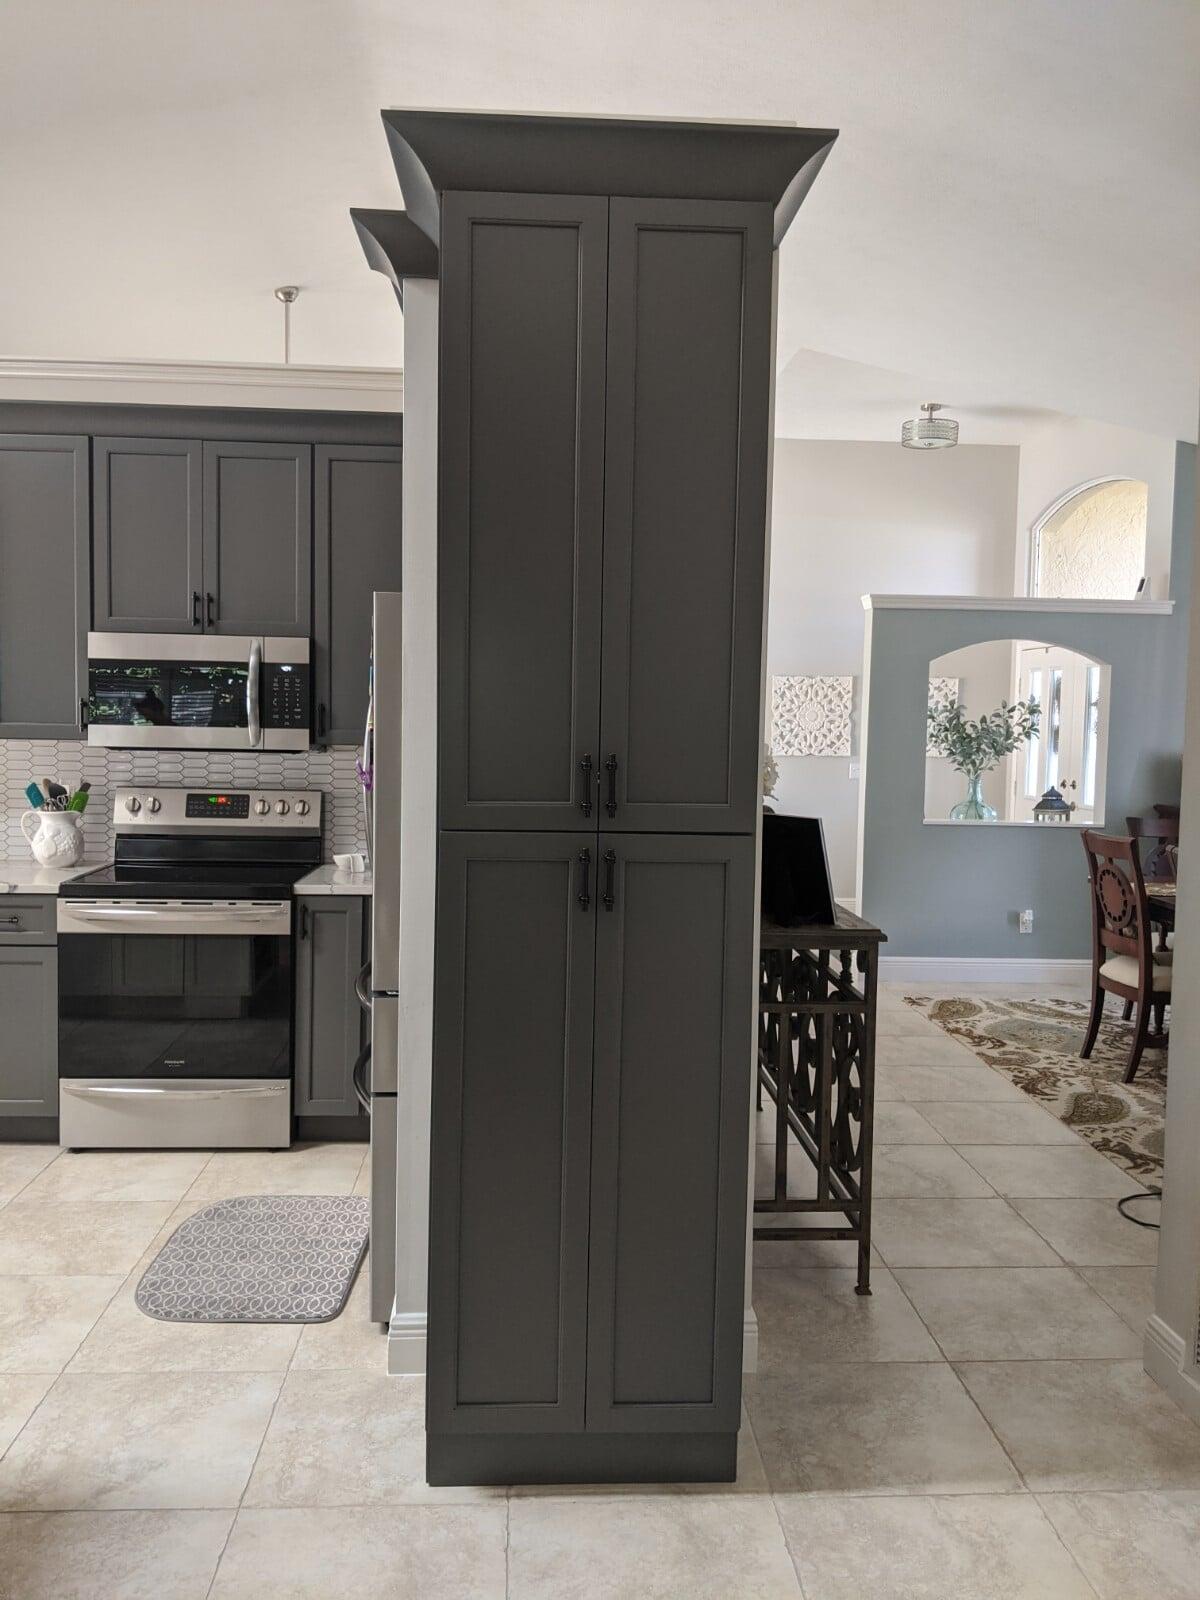 Custom grey cabinets in Port Saint Lucie, FL from Agler Kitchen, Bath & Floors